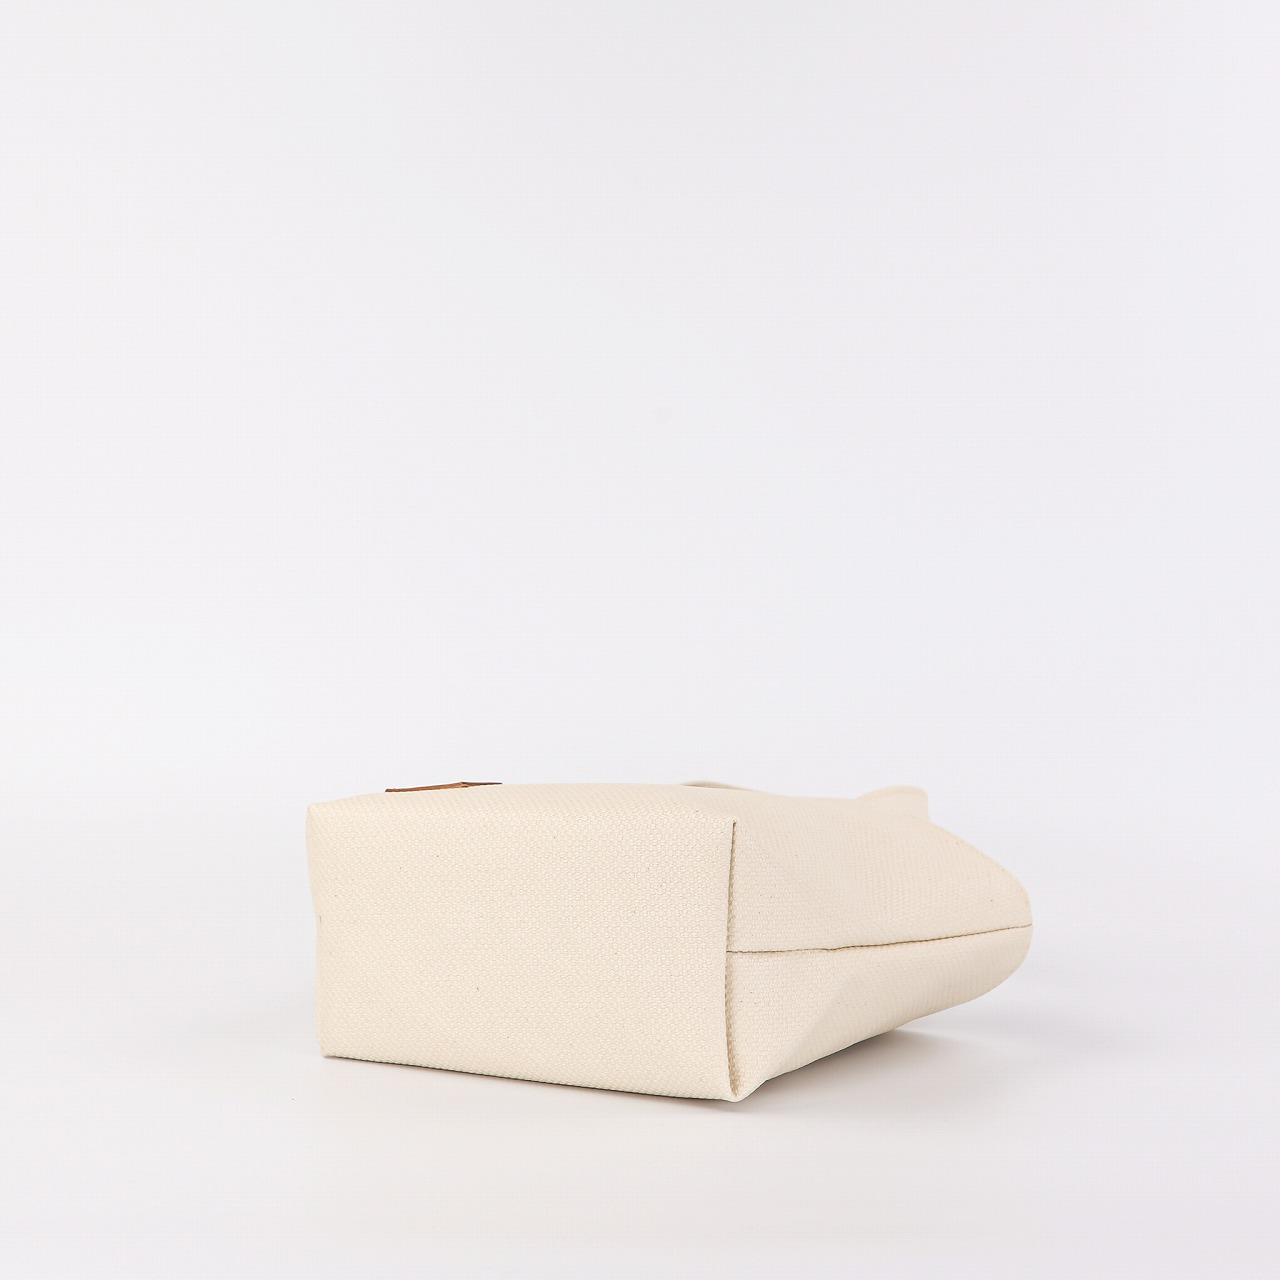 Irie(アイリー)PVC トートバッグ